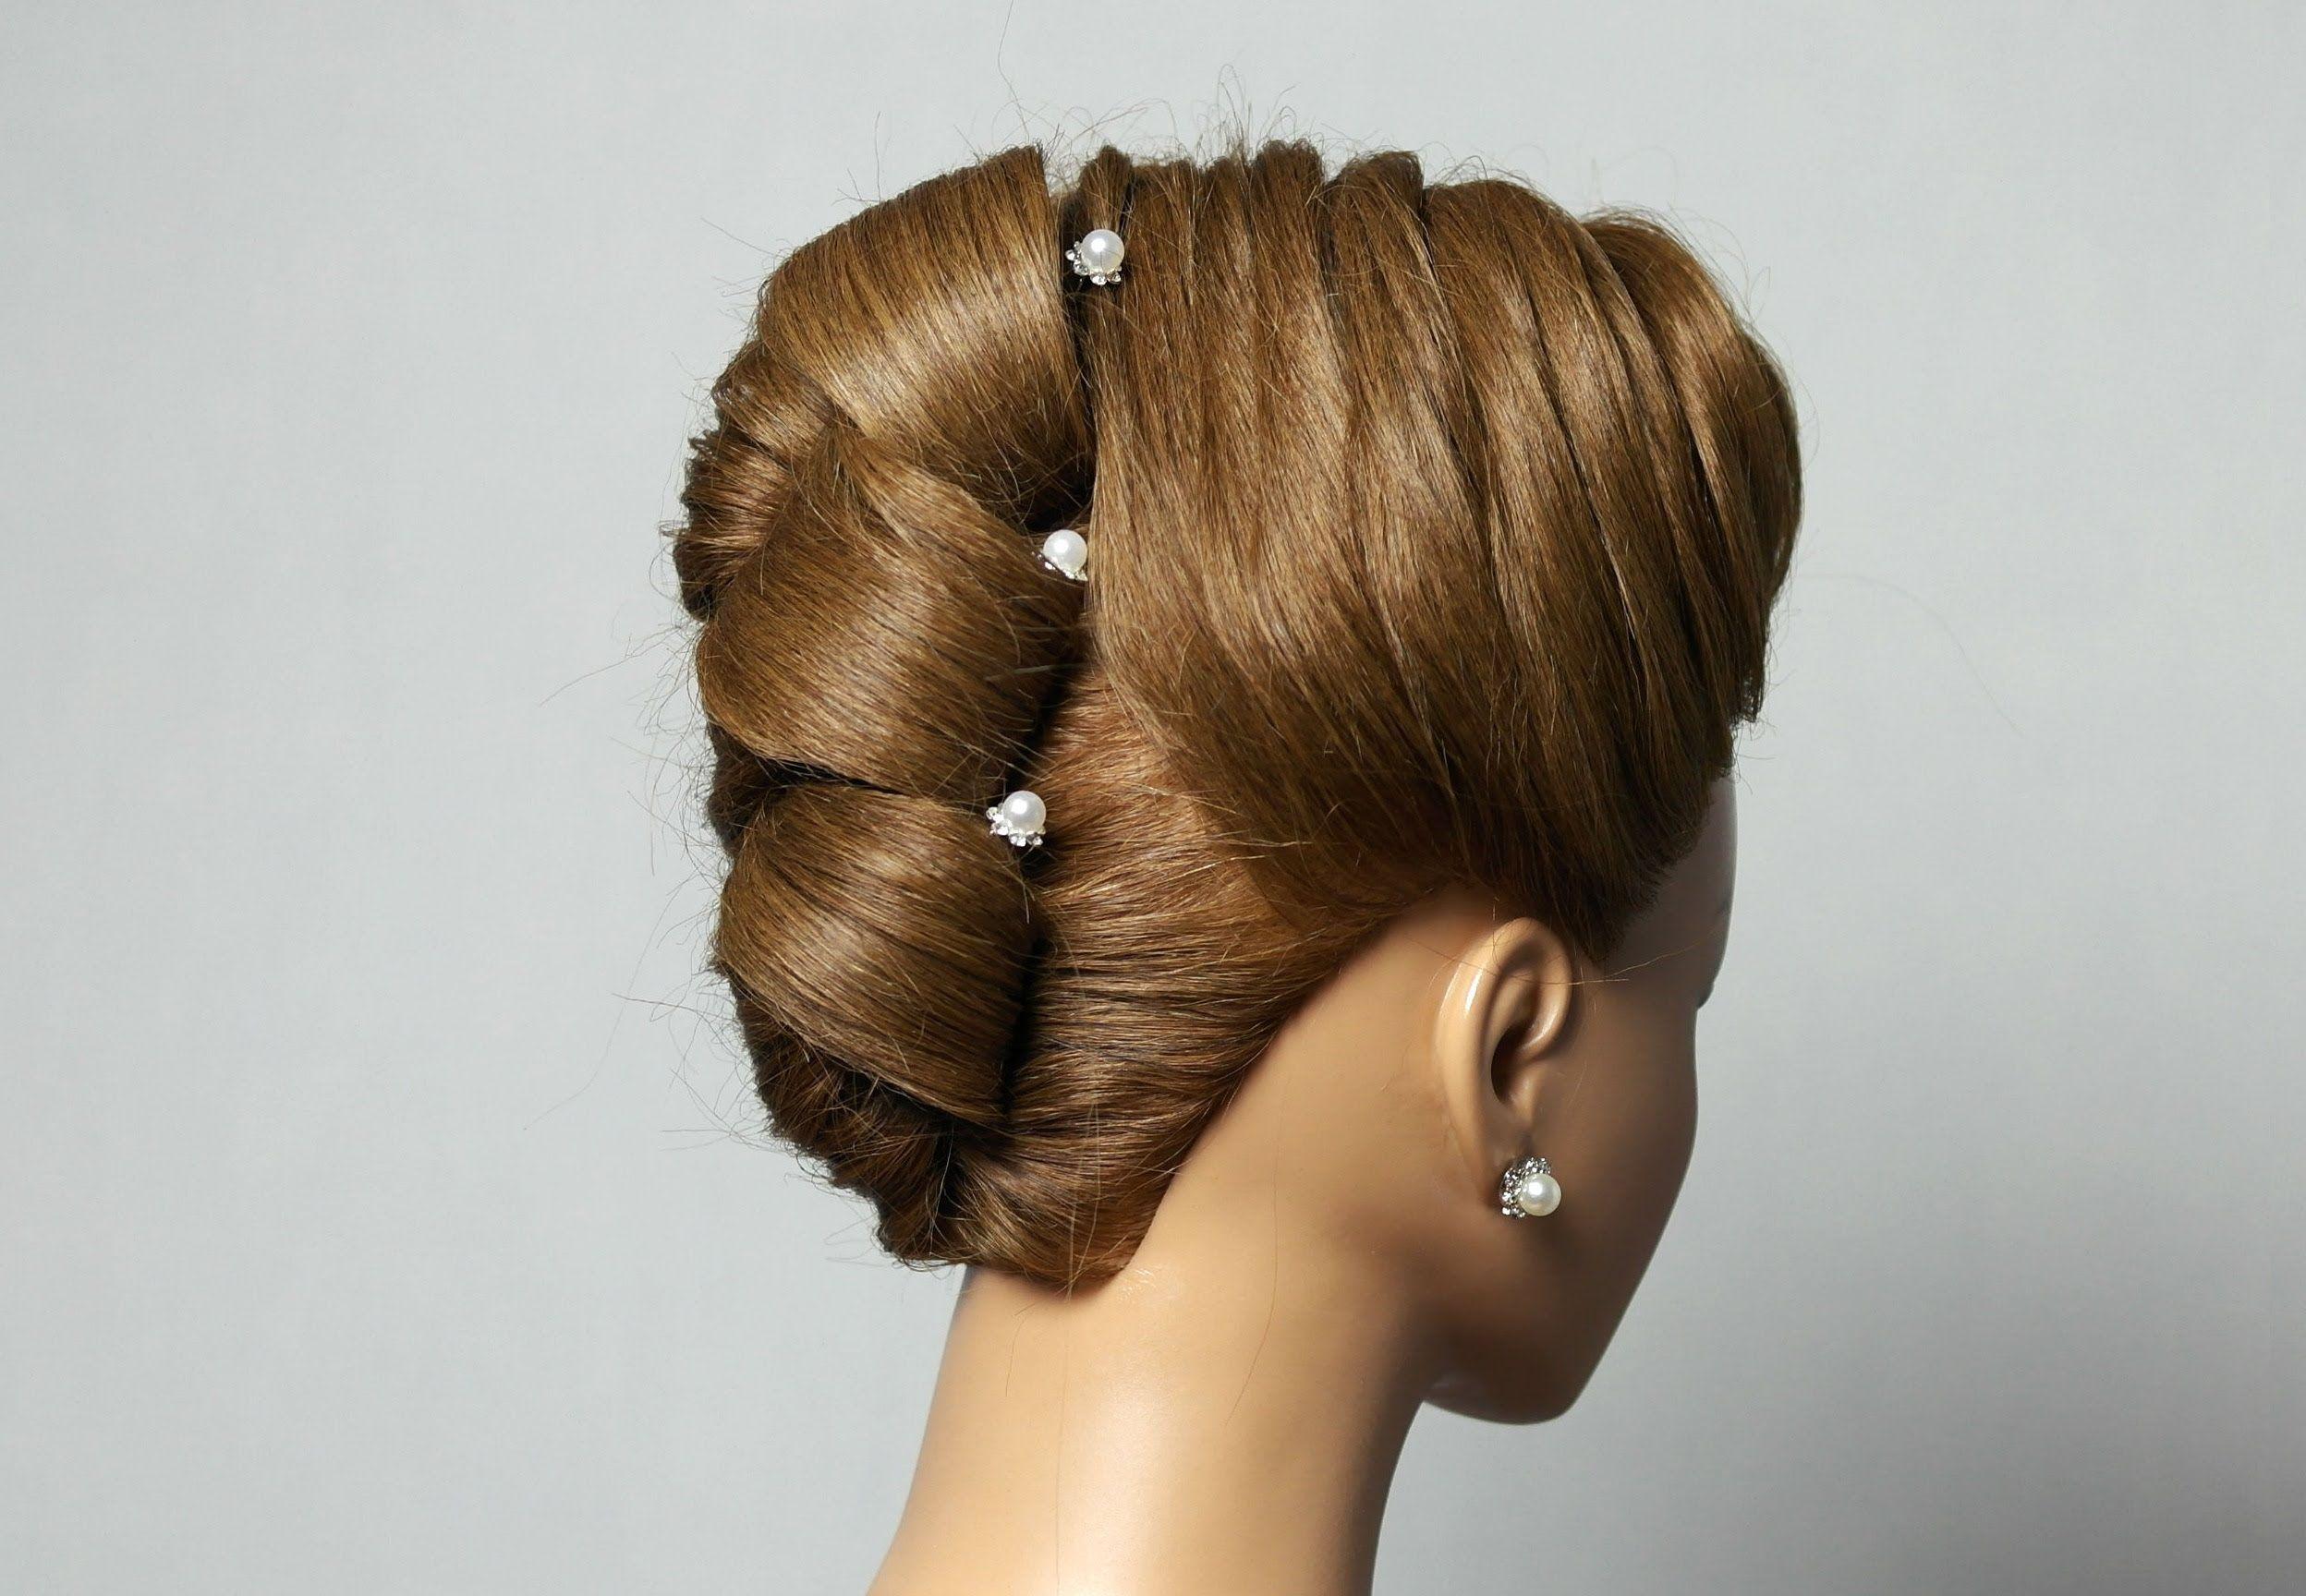 Hairstyle for long medium hair updo hairstyles Вечерняя прическа с